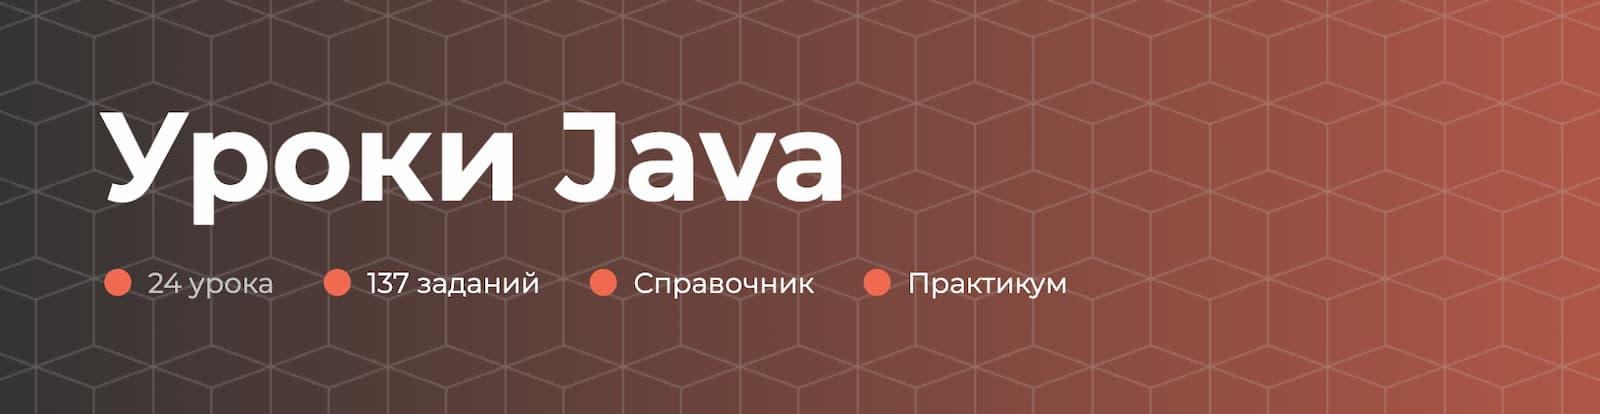 Записаться на курс «Уроки Java» от itProger